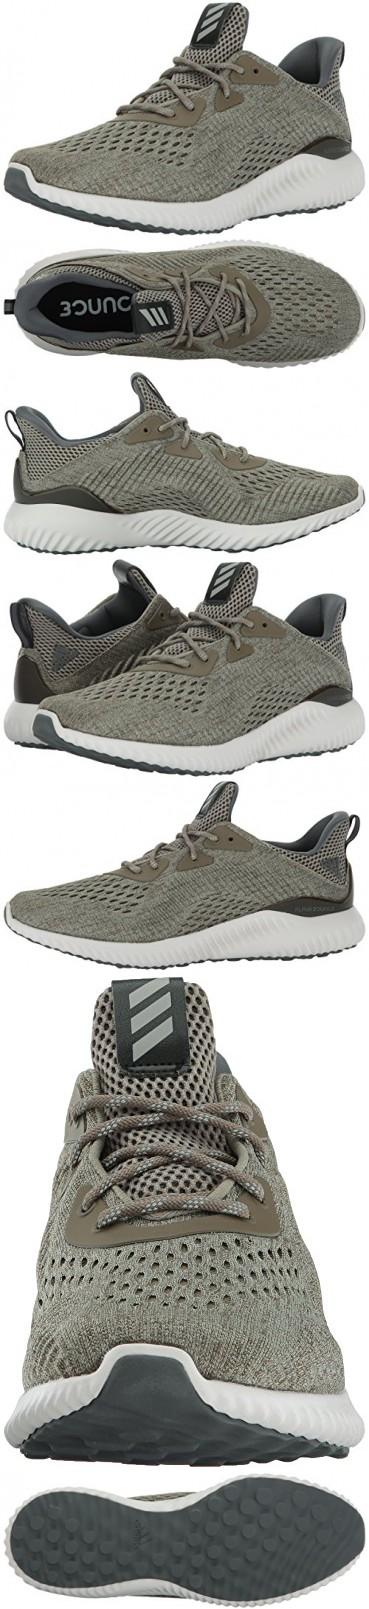 Adidas Performance Men S Alphabounce Em M Running Shoe Trace